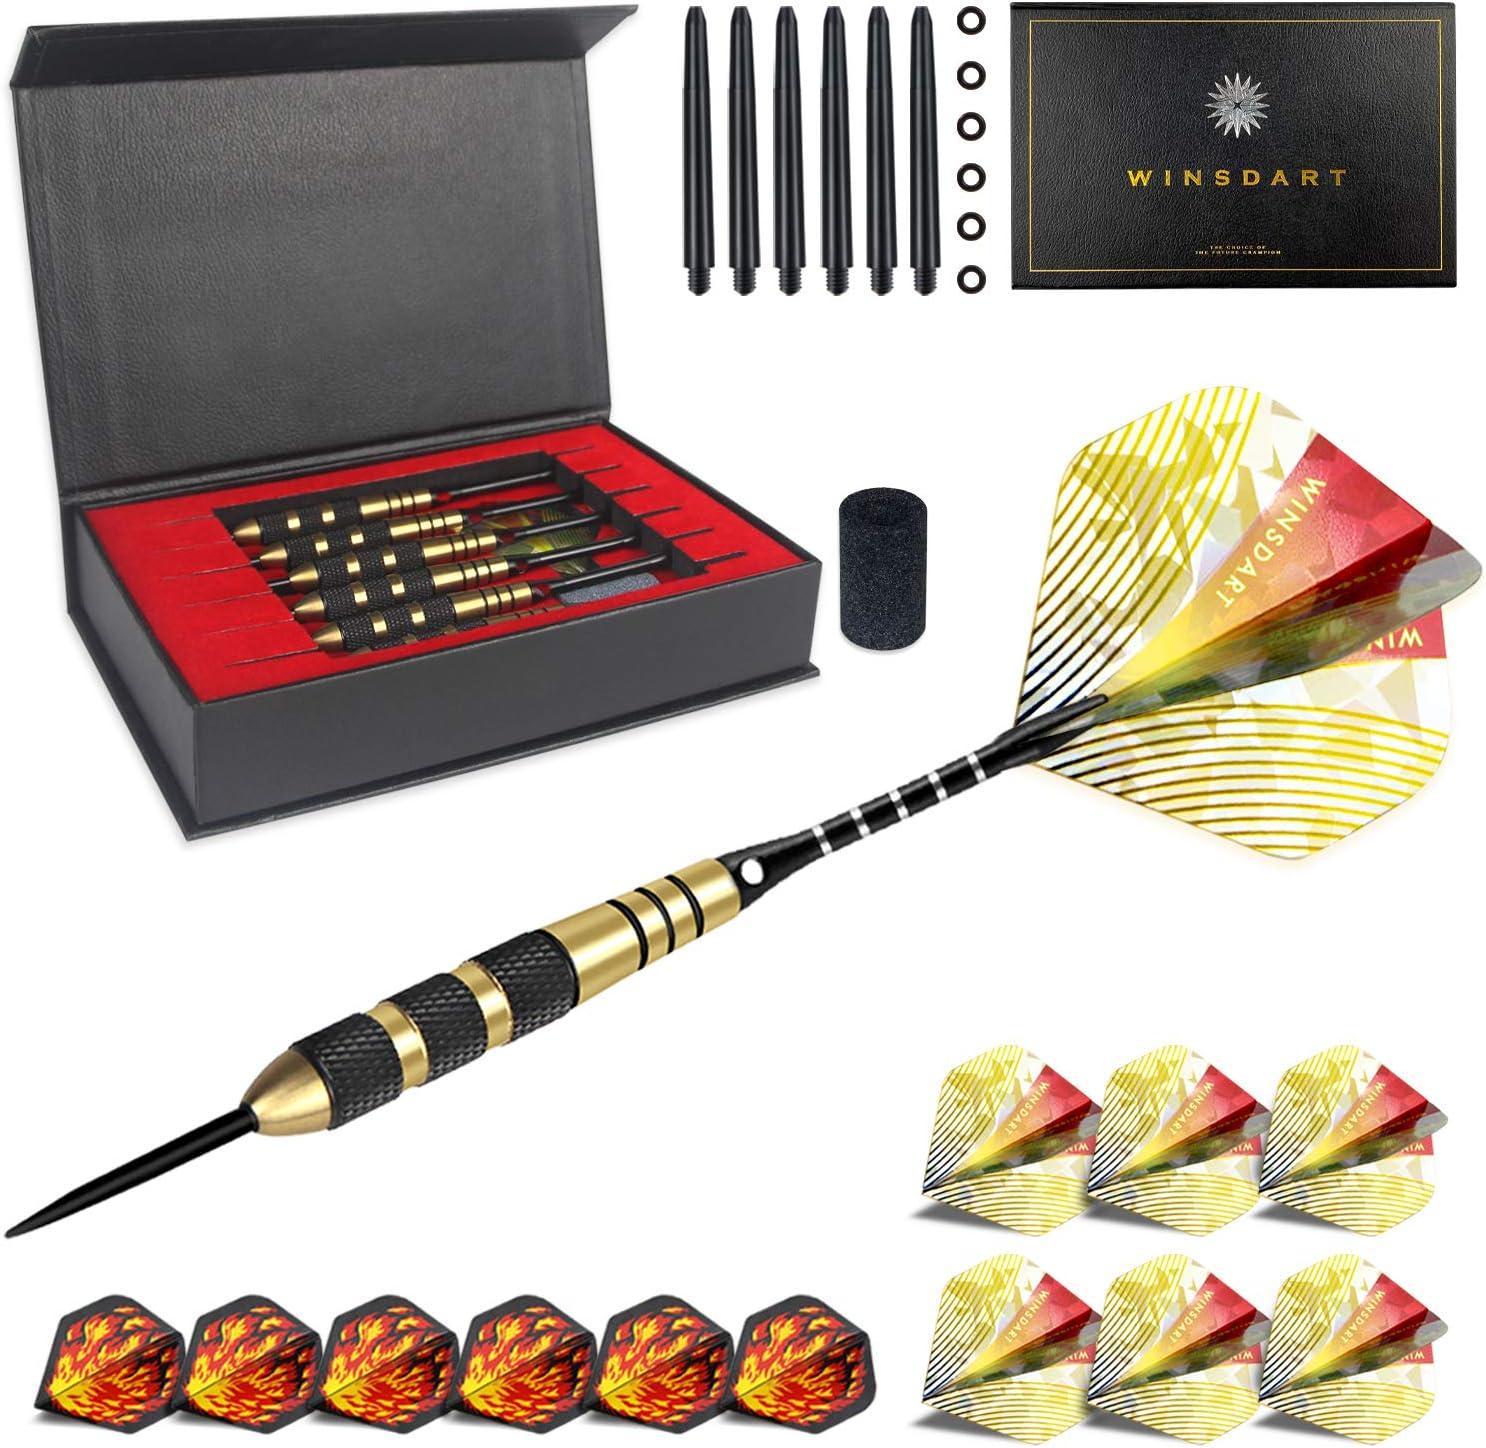 WINSDART Professional Darts Set, Steel Tip Darts 6 Pack 22G Brass Barrels with 12 Aluminum Dart Shafts and Flights, 6 O-Rings + Darts Sharpener + an Gift Box